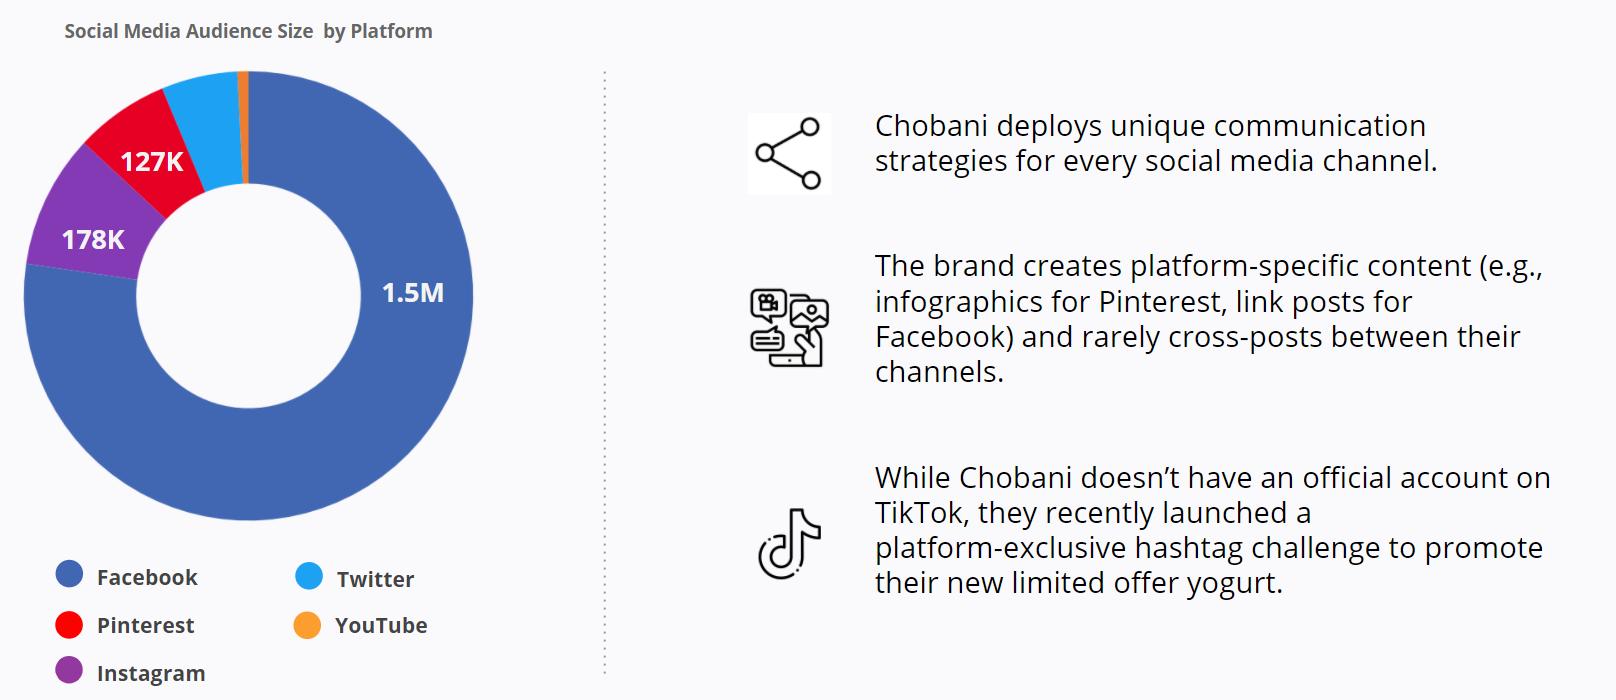 Chobani - Social Media Audience by Platform